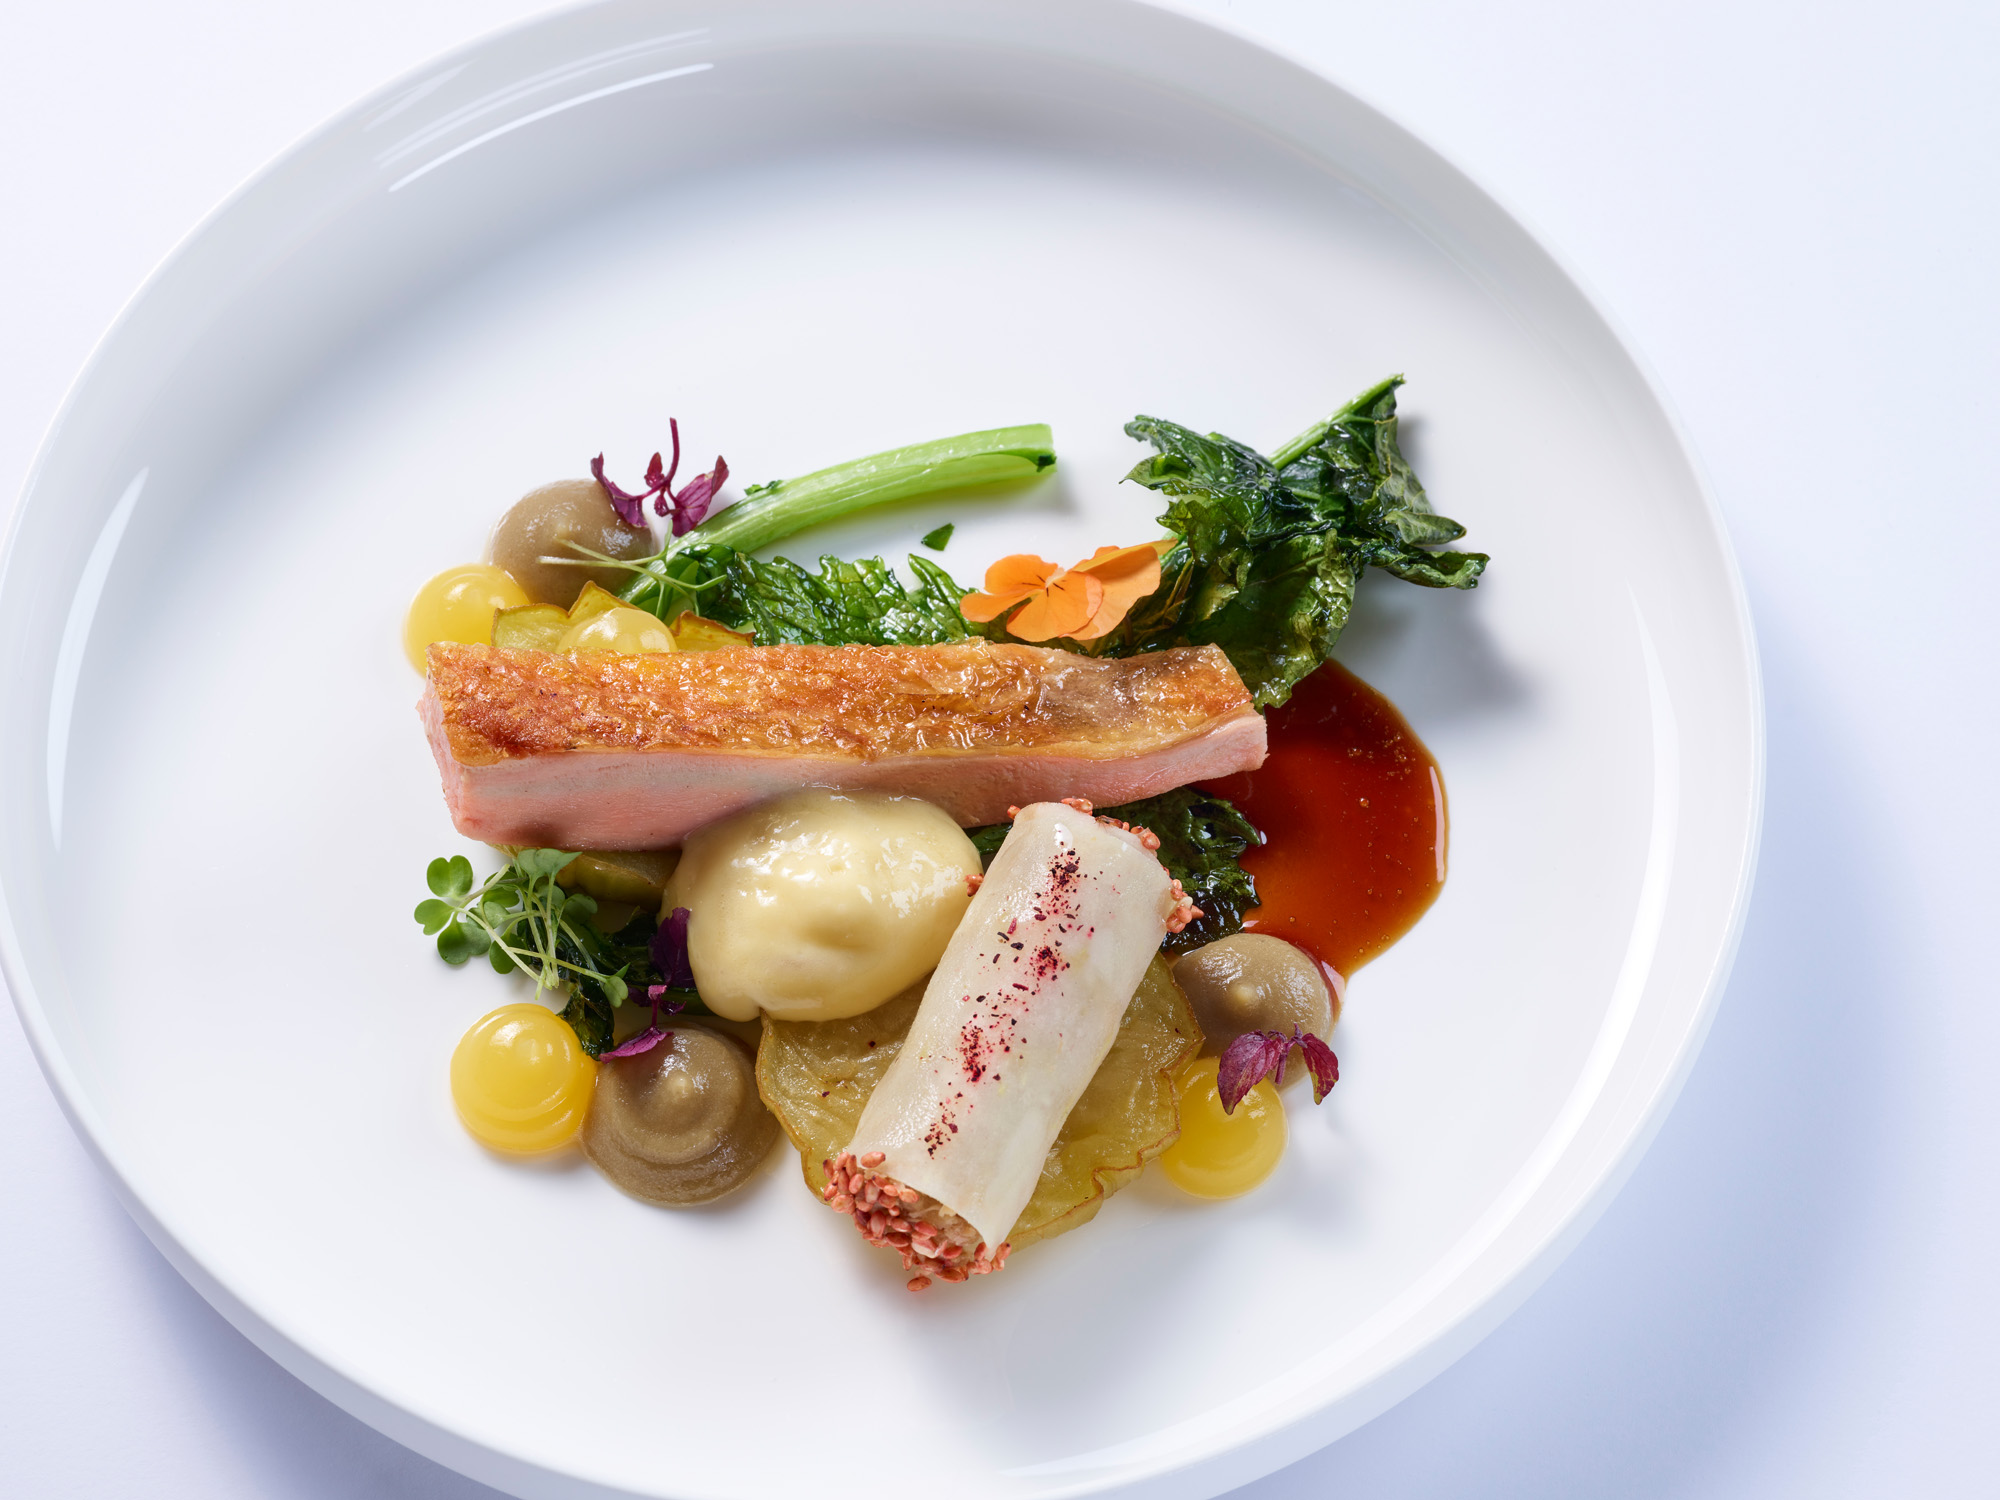 iSi Speisemeisterei 21 9 176183 - iSi Kulinarik: Inspiring Food